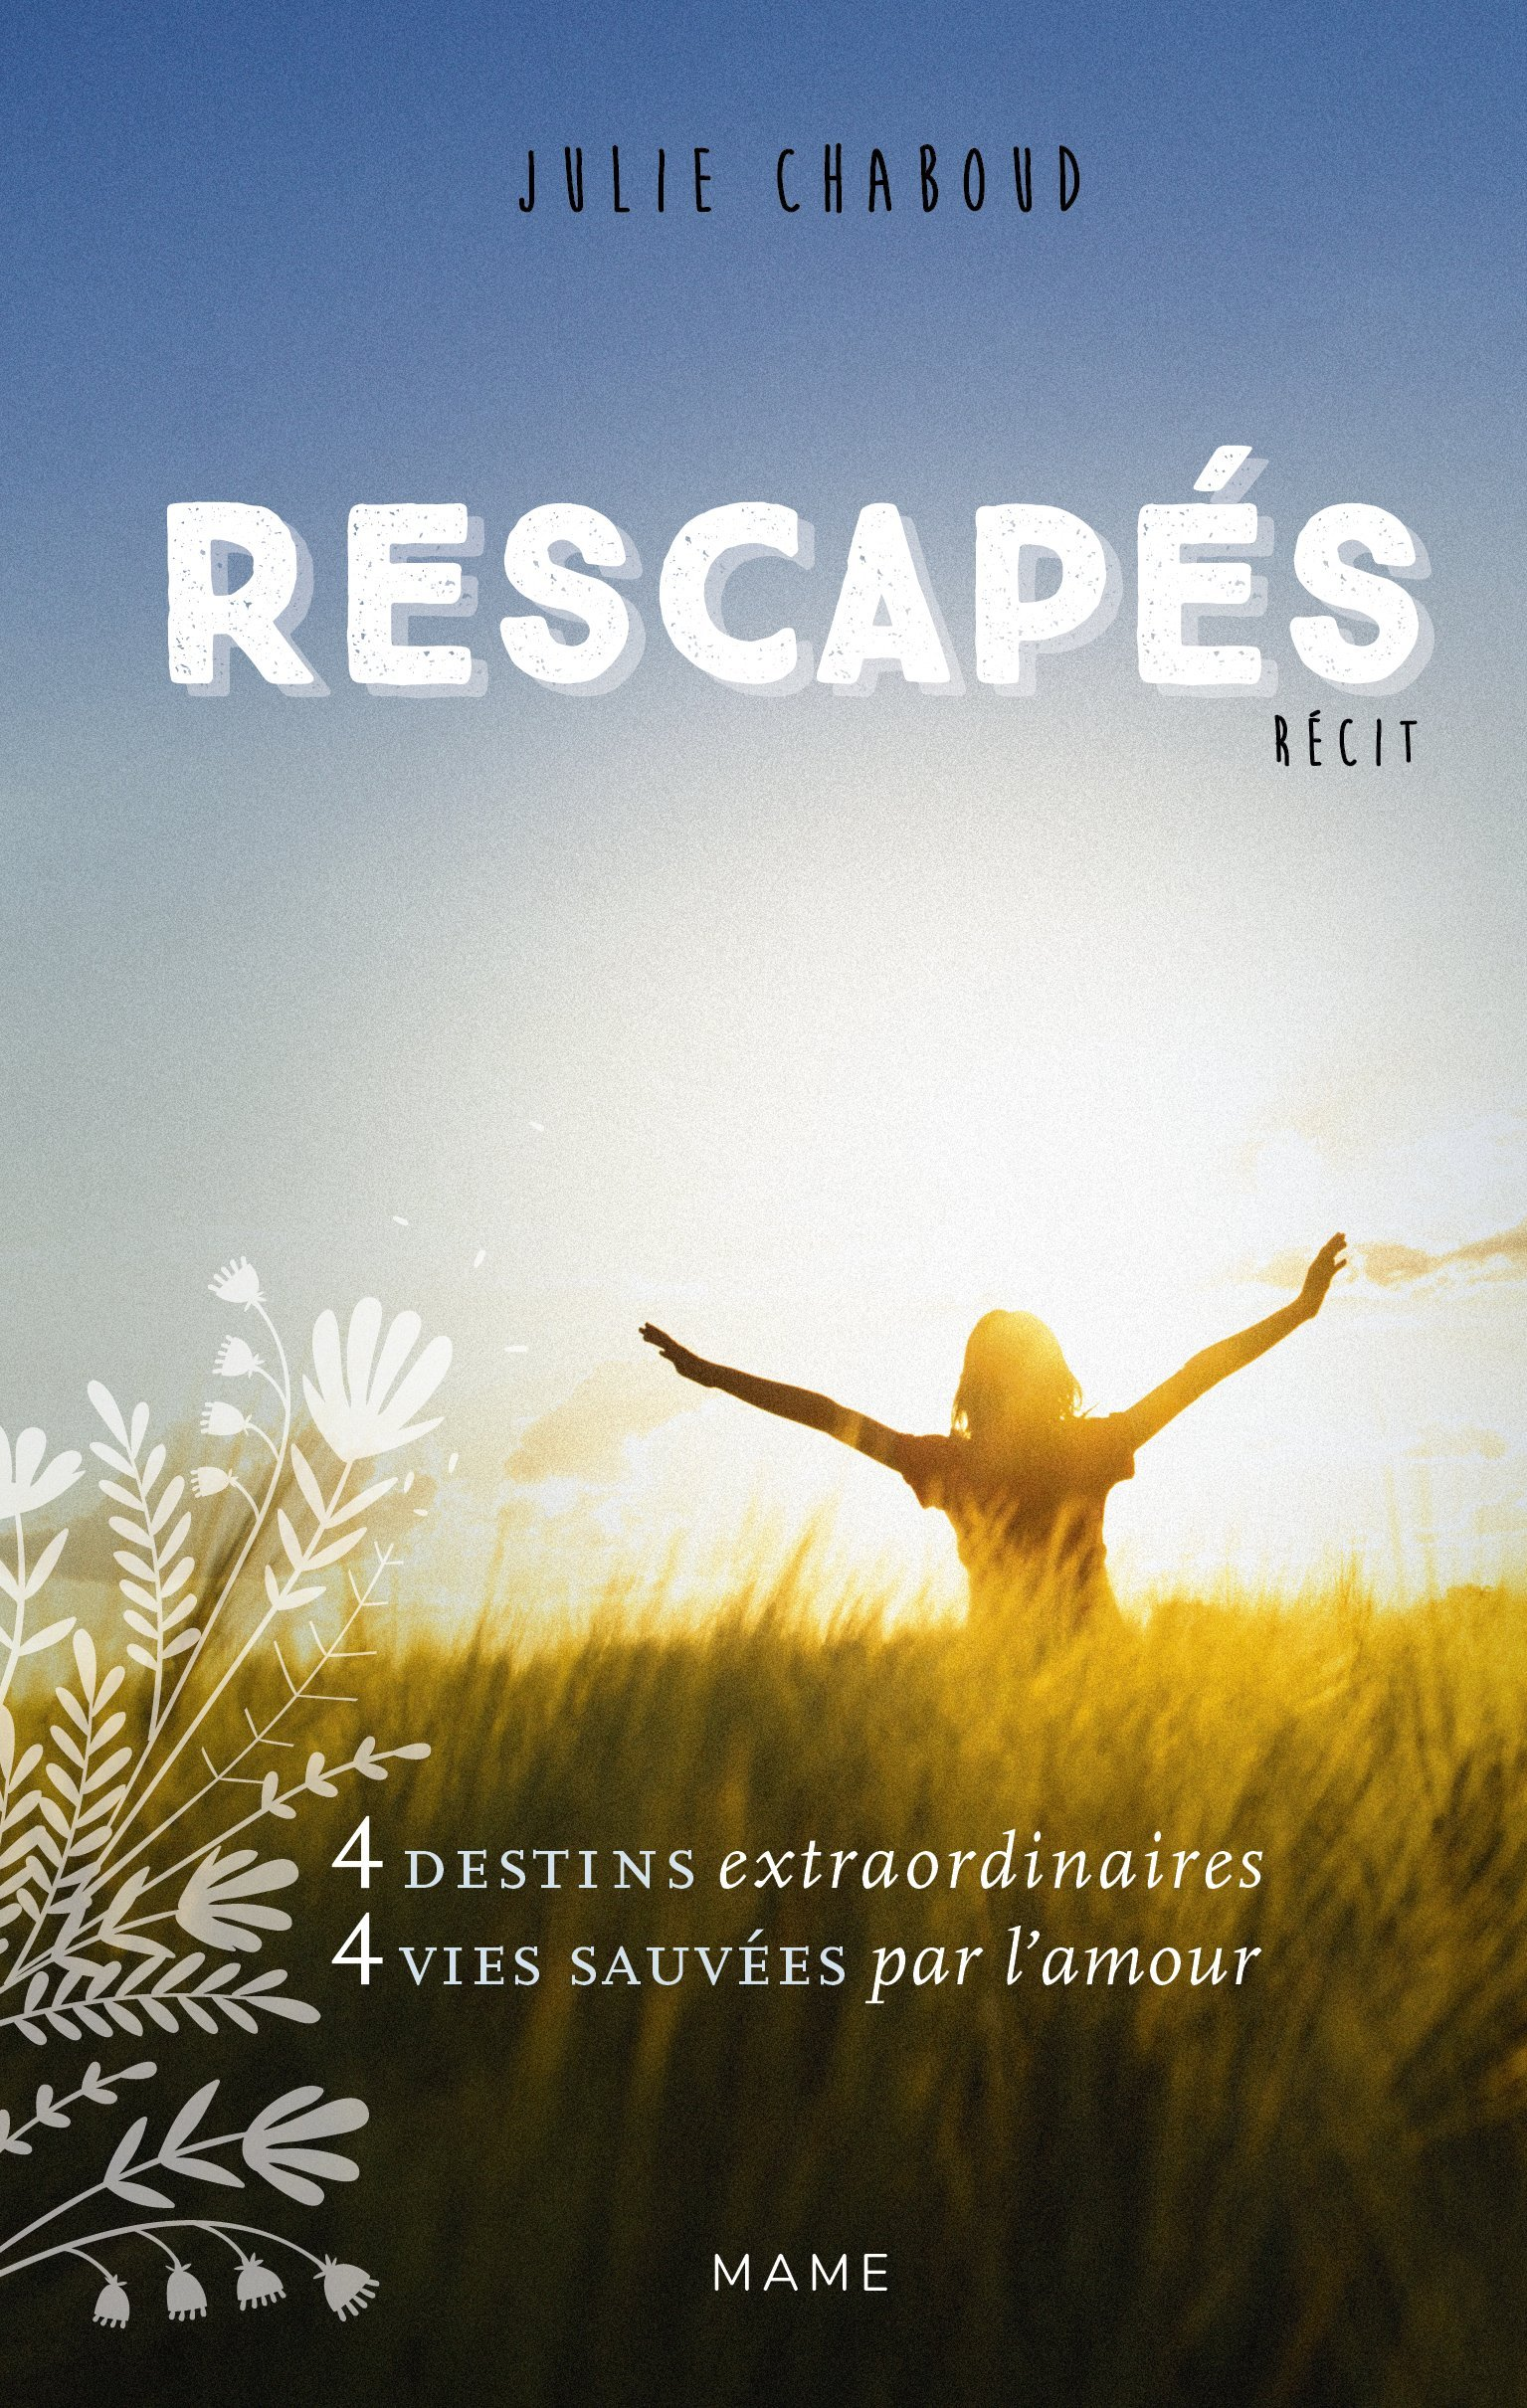 RESCAPES